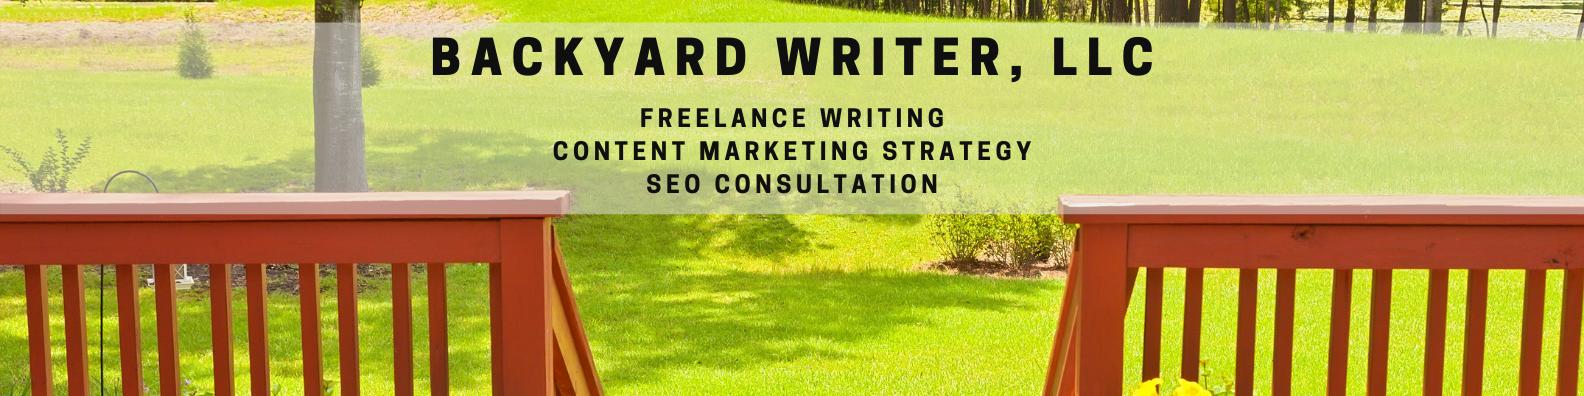 Backyard Writer